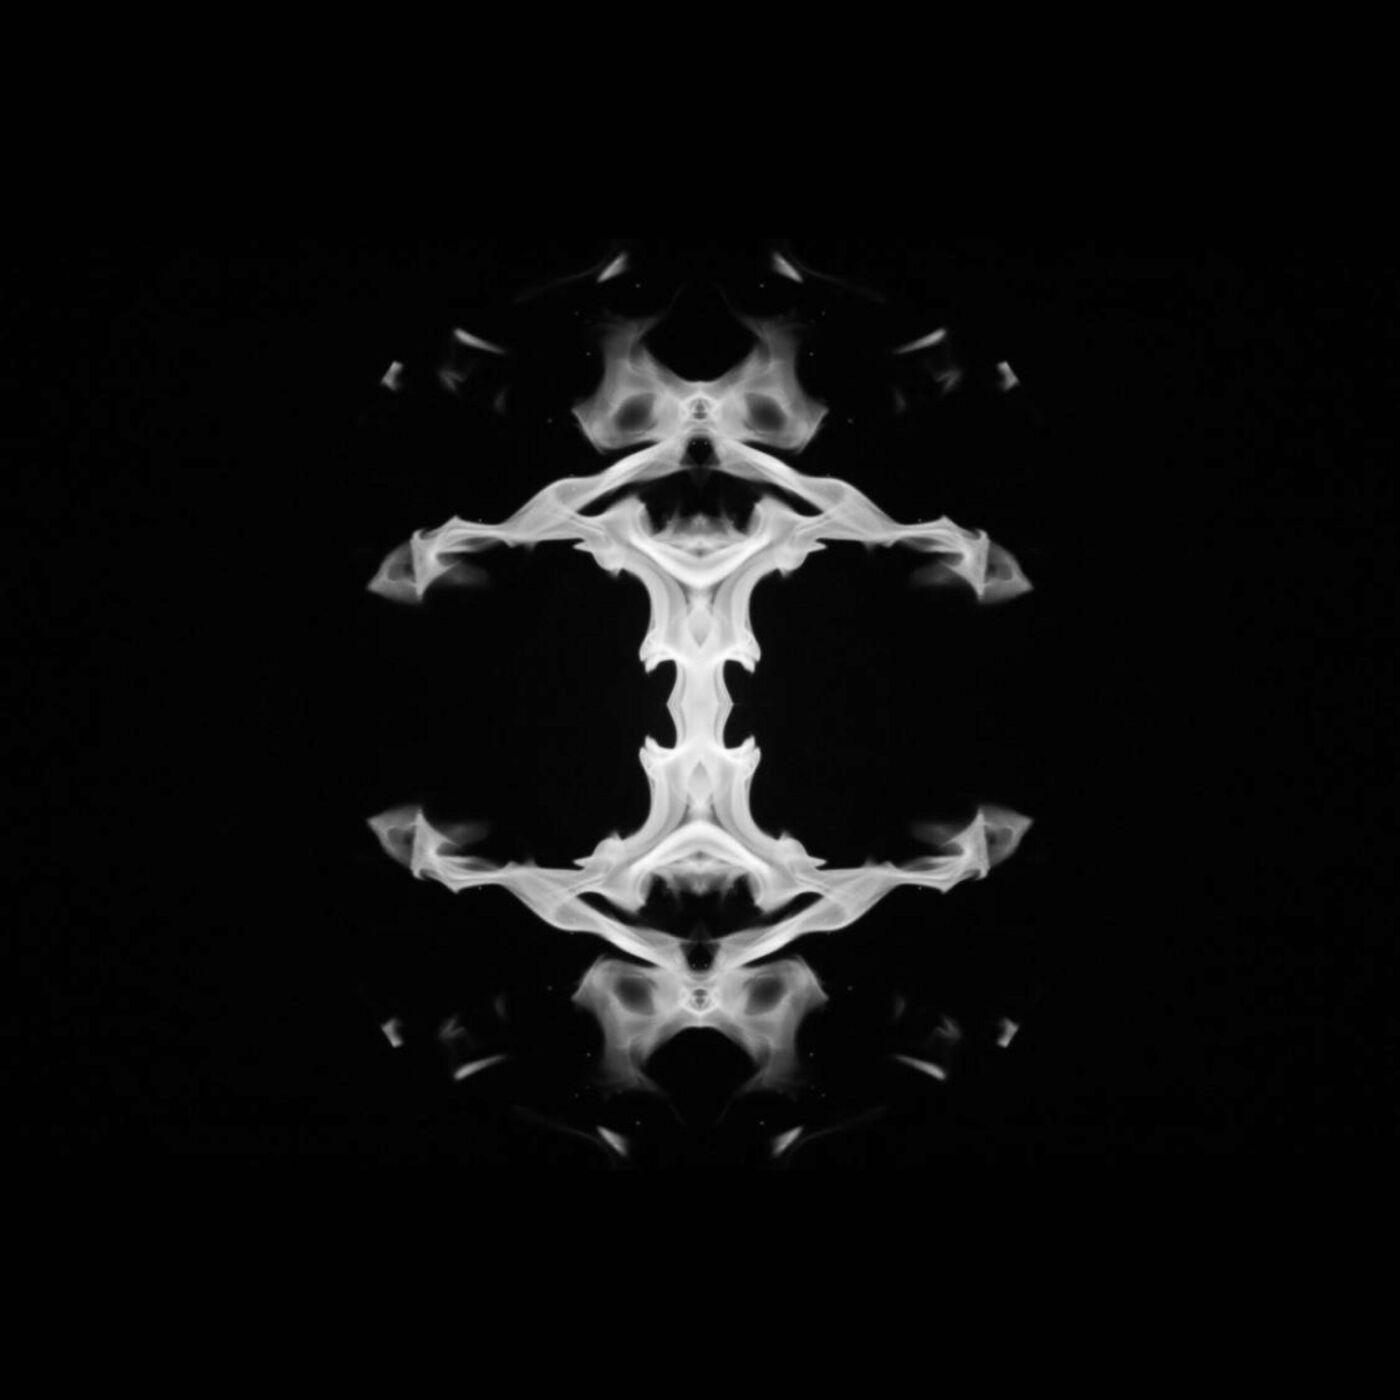 Classic Jack - Gatteka [single] (2020)